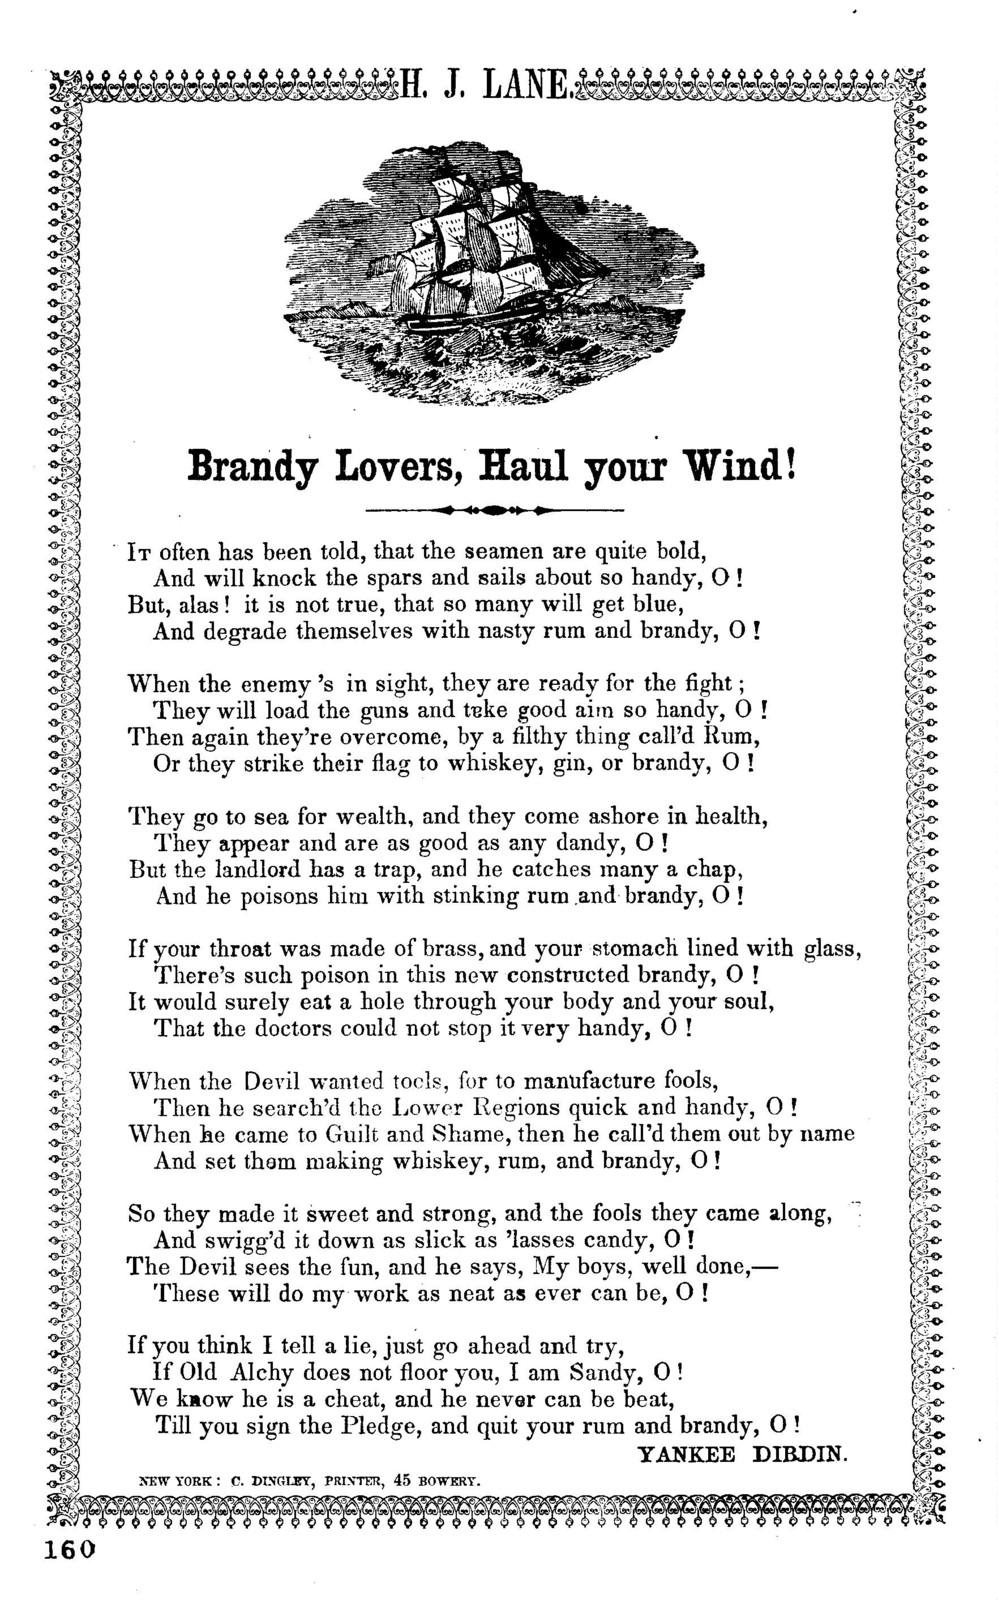 Brandy lovers, haul your wind! Yankee Dibdin. New York: C. Dingley , Printer, 45 Bowery